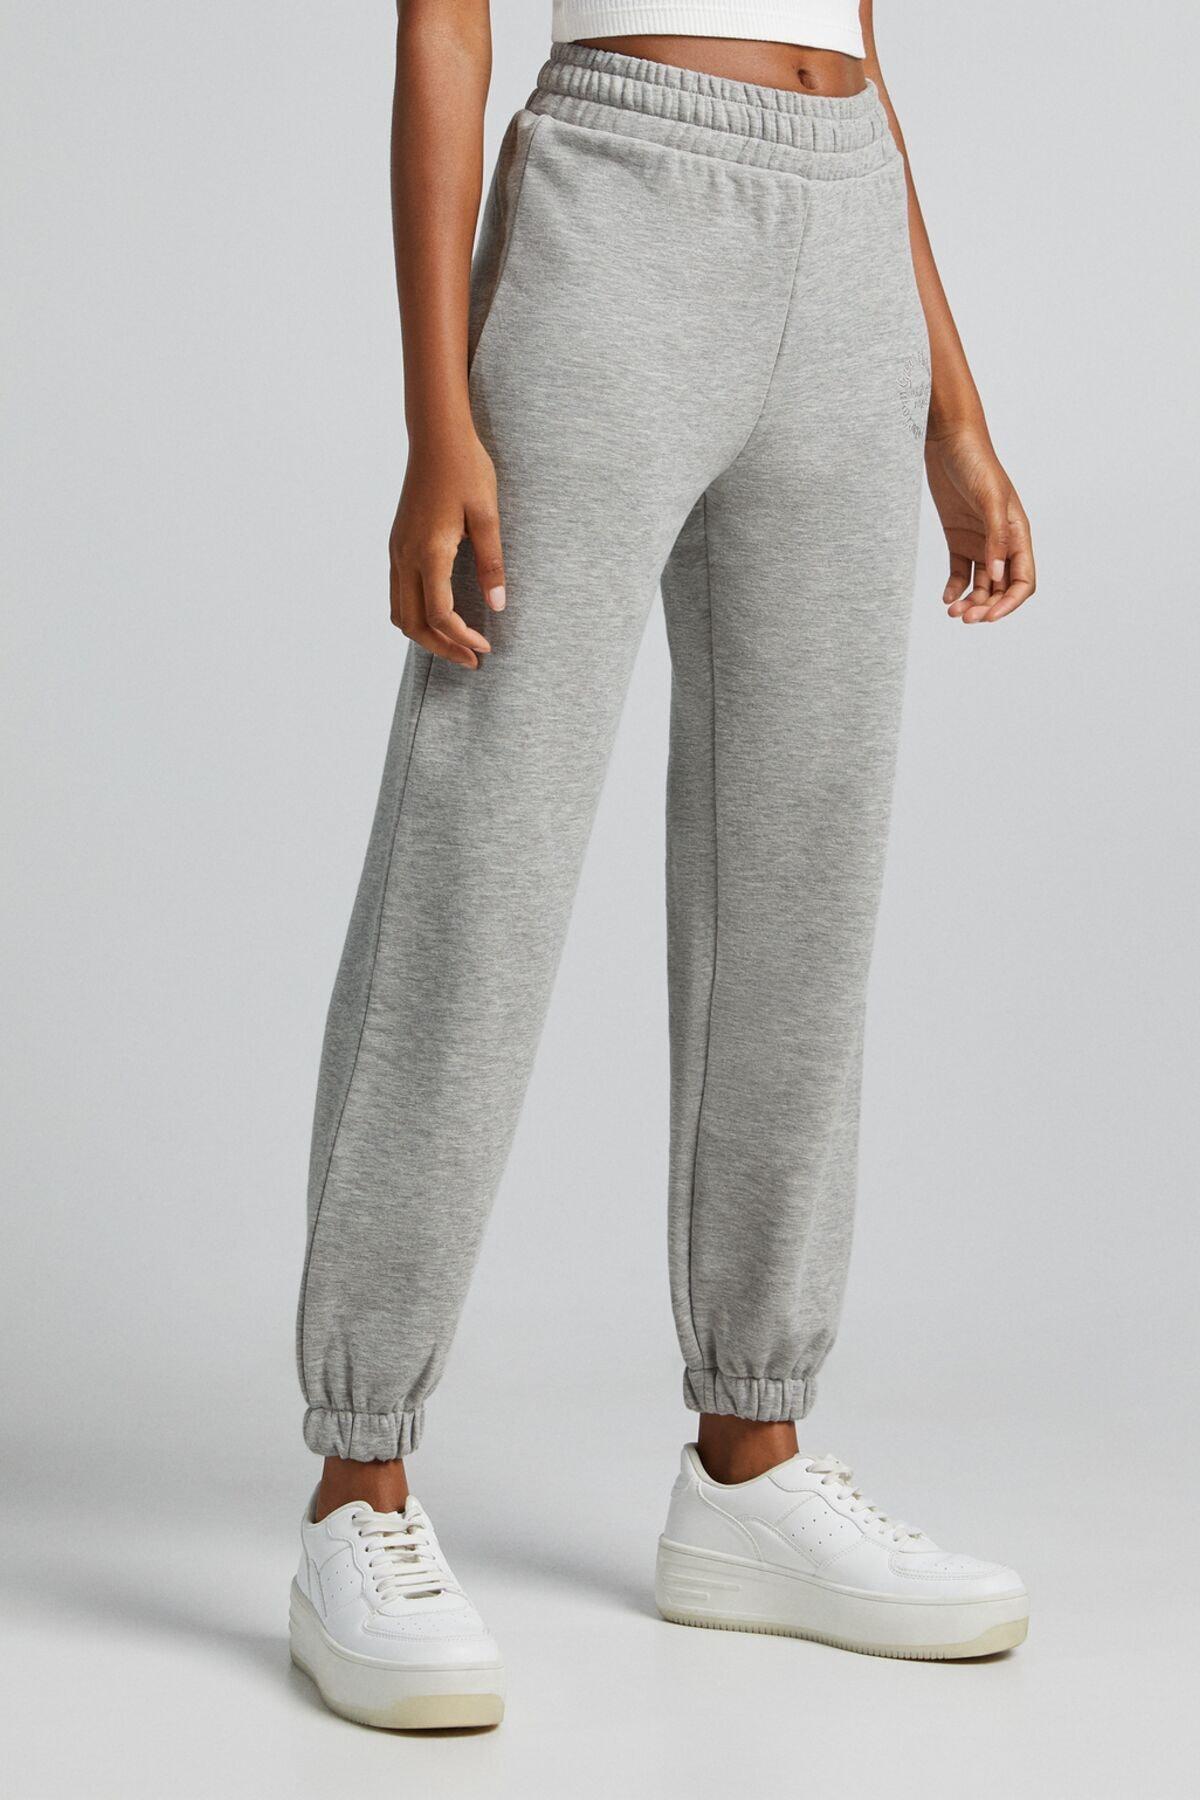 Bershka Kadın Gri Koton Jogging Fit Pantolon